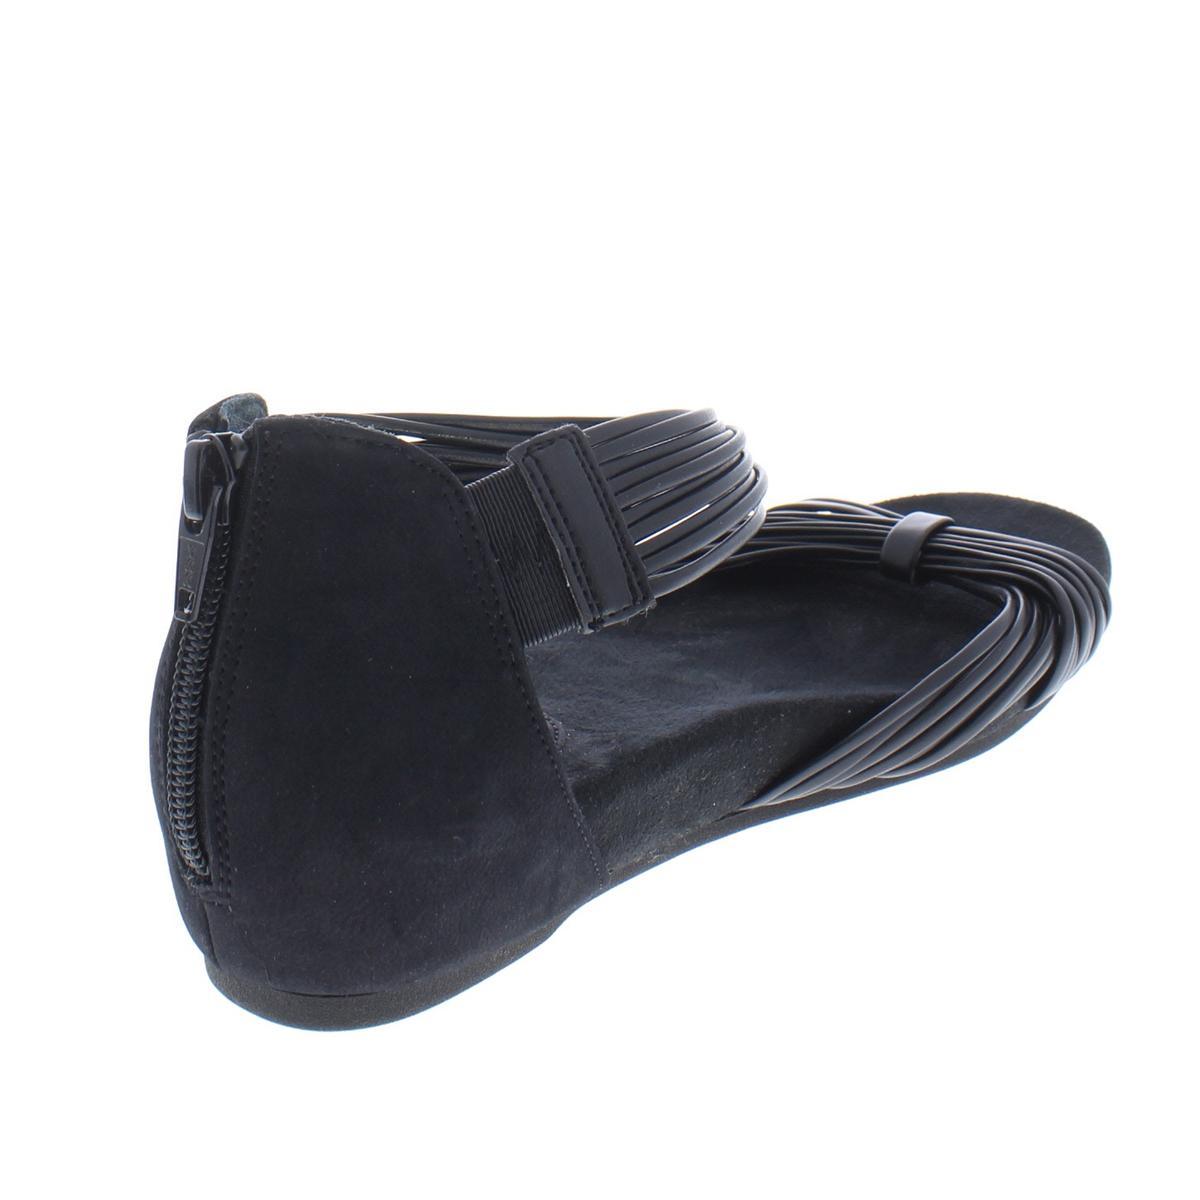 Giani-Bernini-Womens-Jhene-Strappy-Criss-Cross-Sandals-Shoes-Flats-BHFO-9685 thumbnail 5